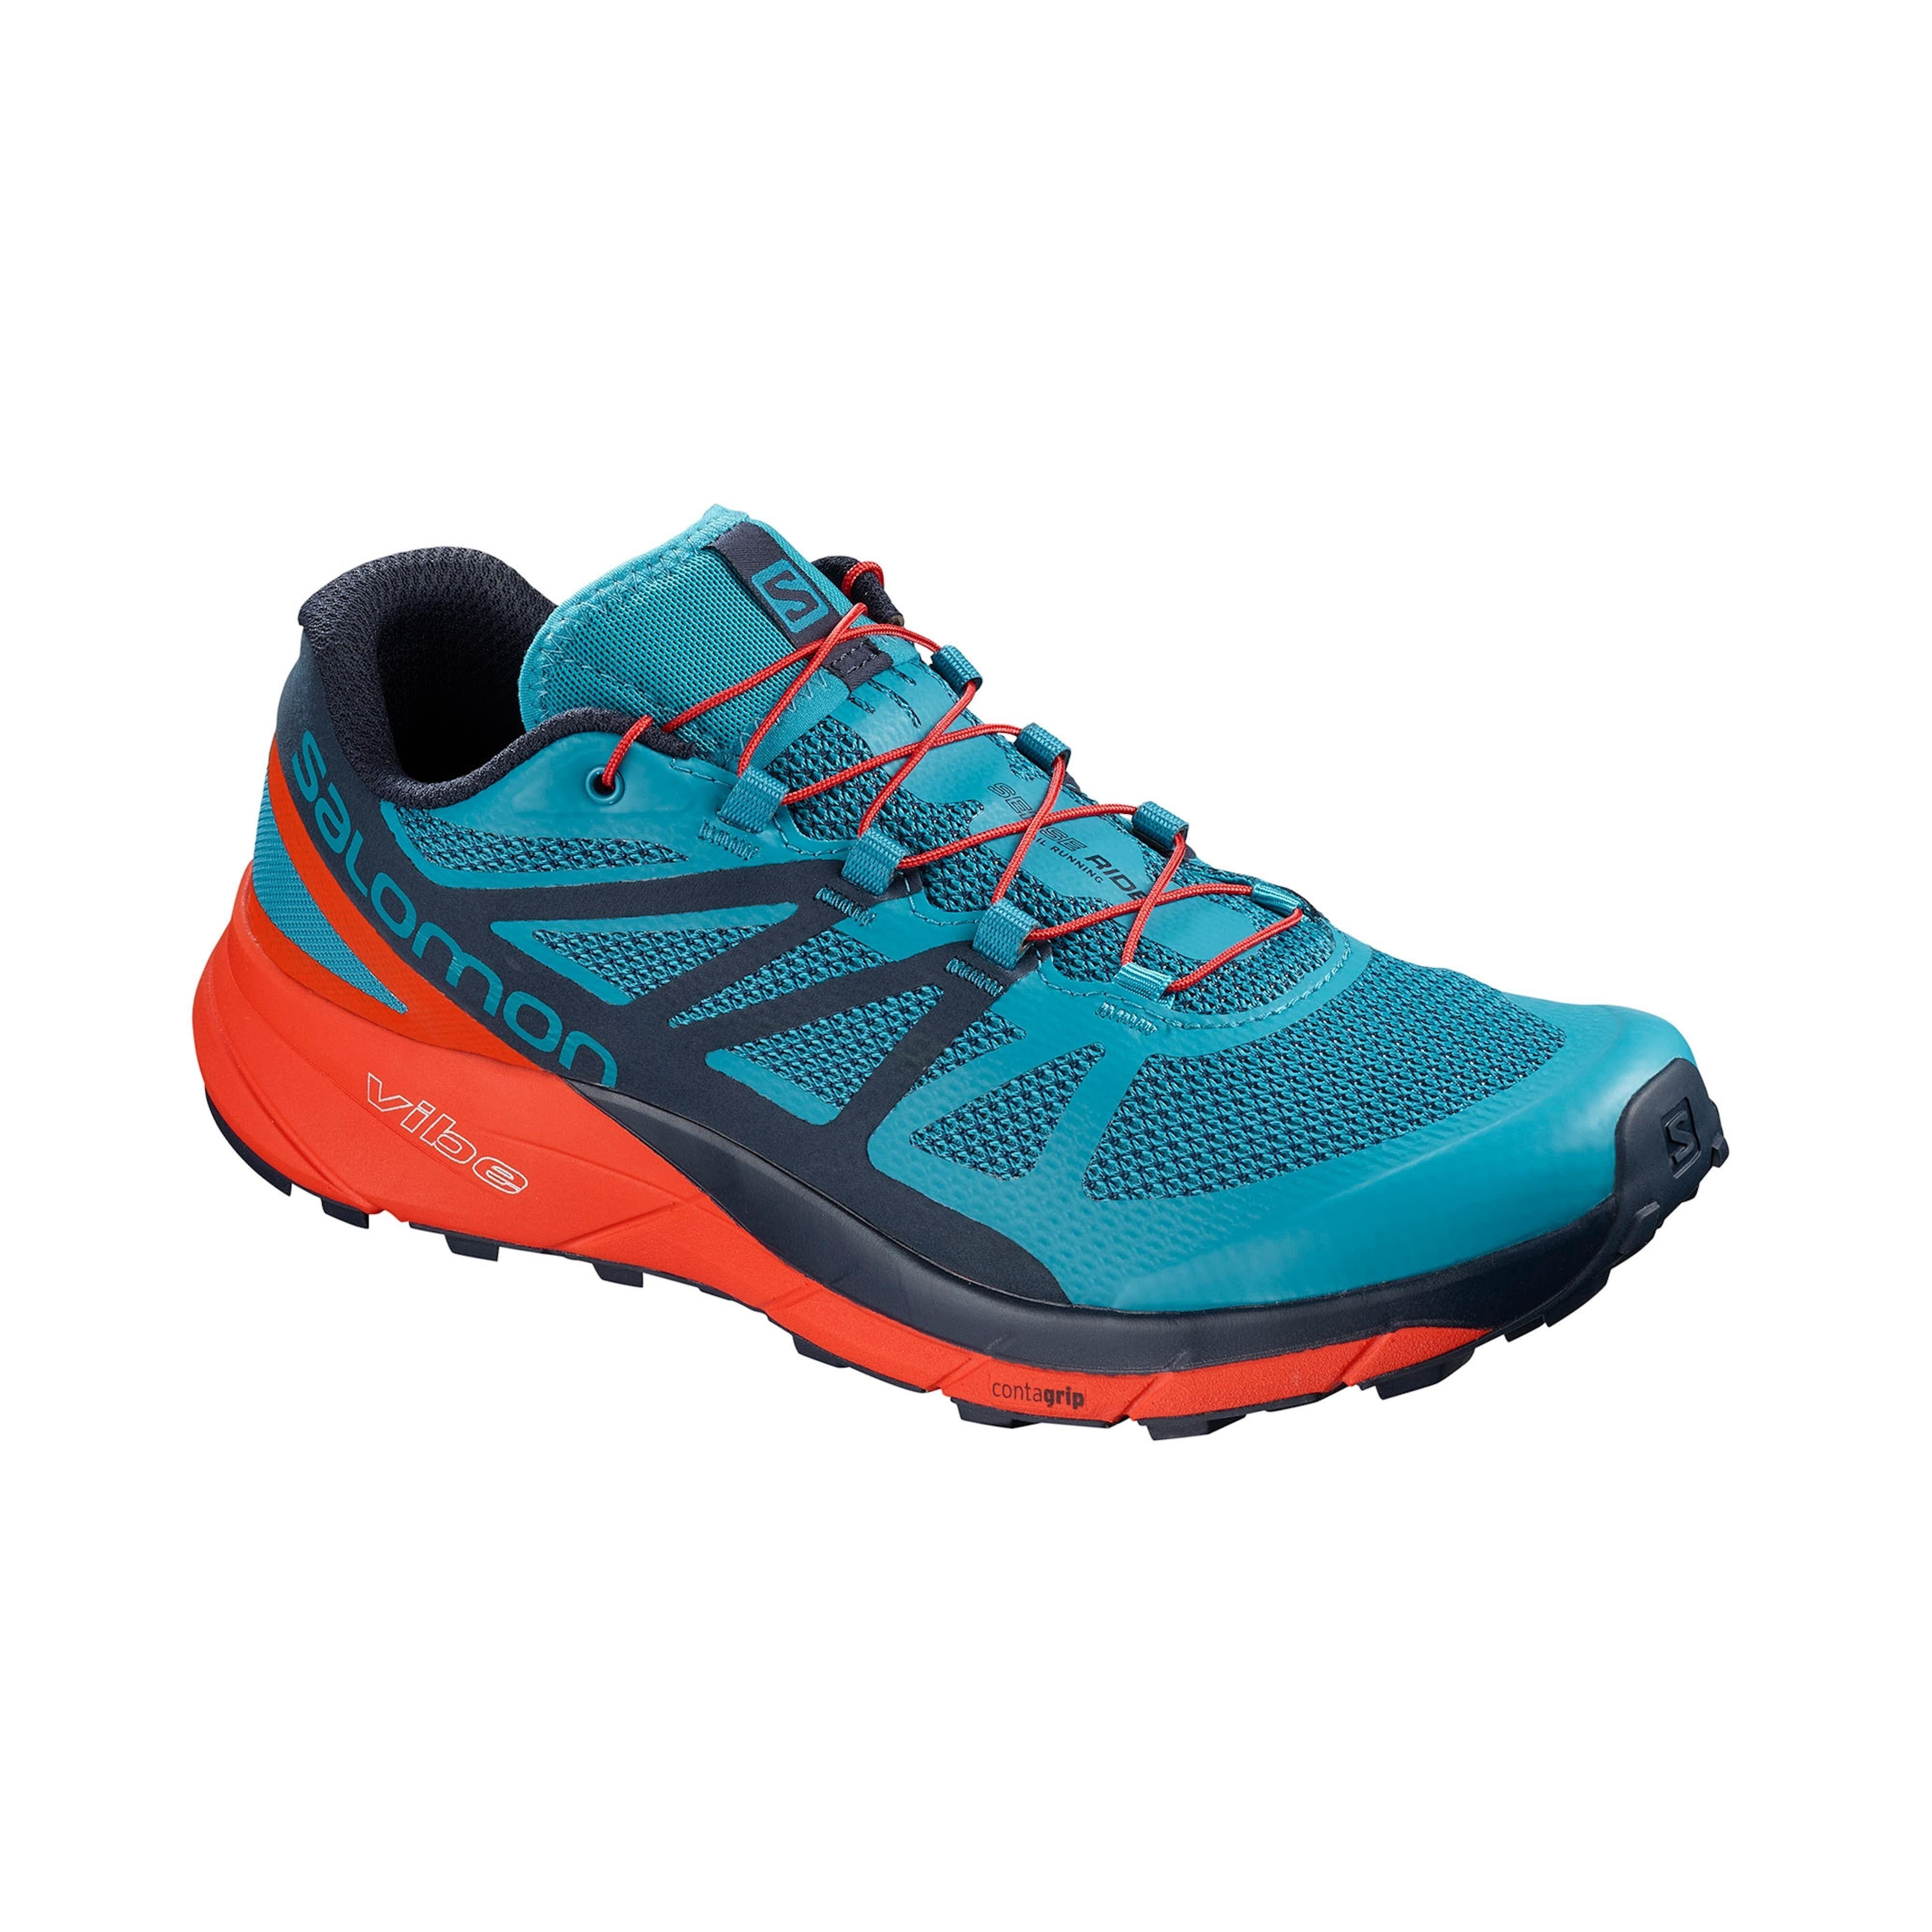 Salomon Sense Ride Men s Shoes 4f25edf75ac